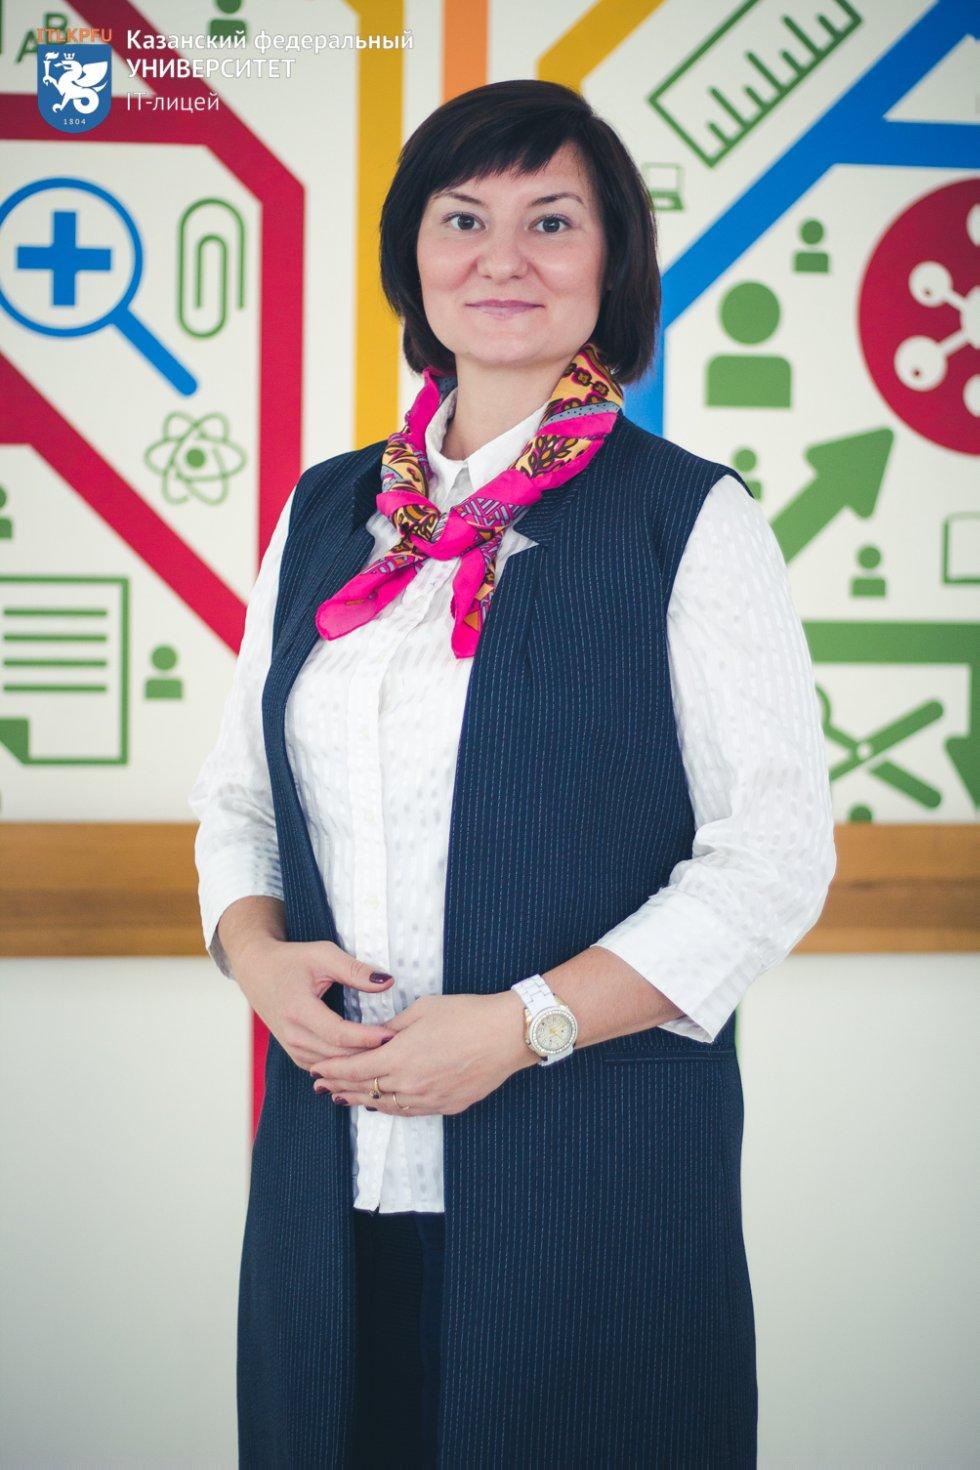 Абубакирова Наиля Накиповна